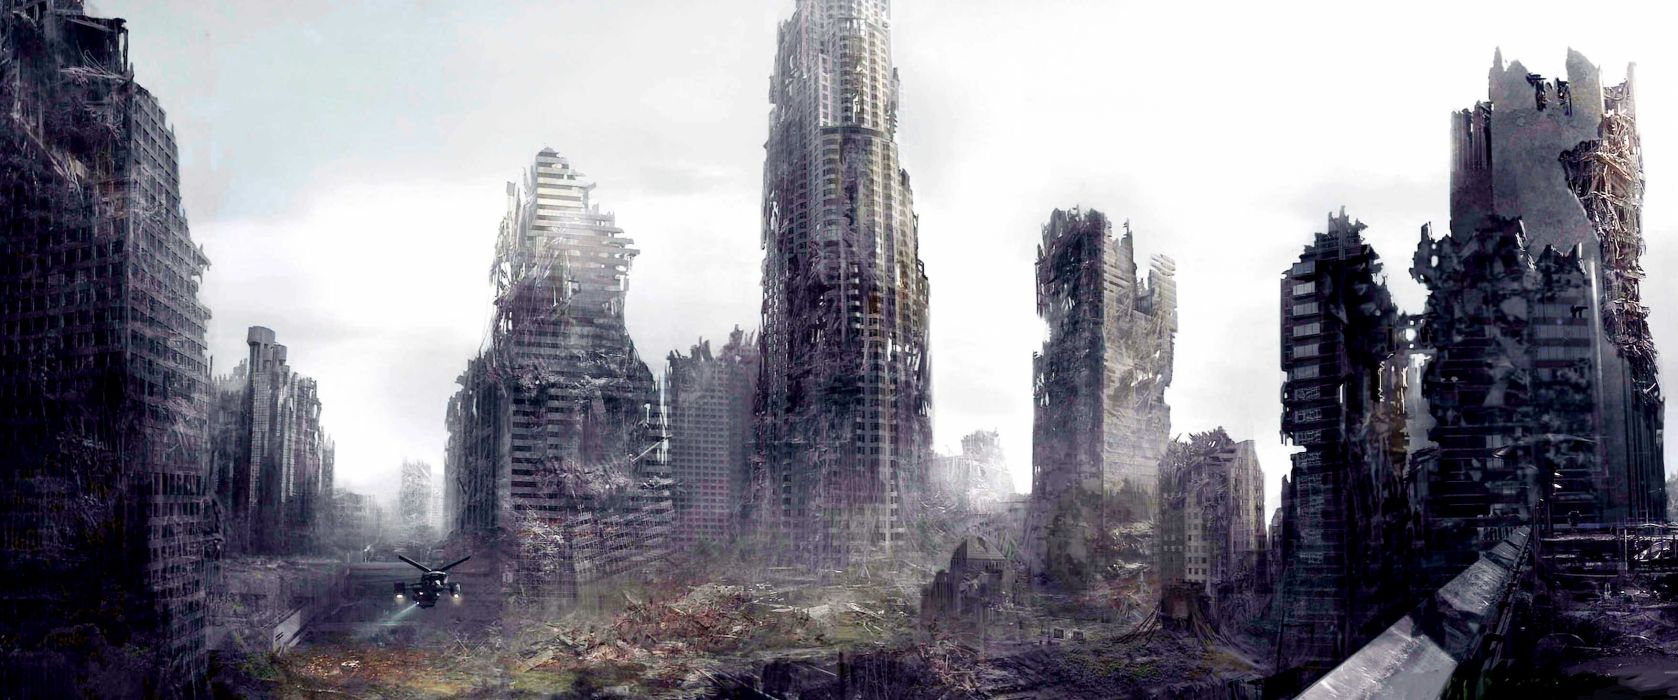 TERMINATOR sci-fi action movie film (39) wallpaper